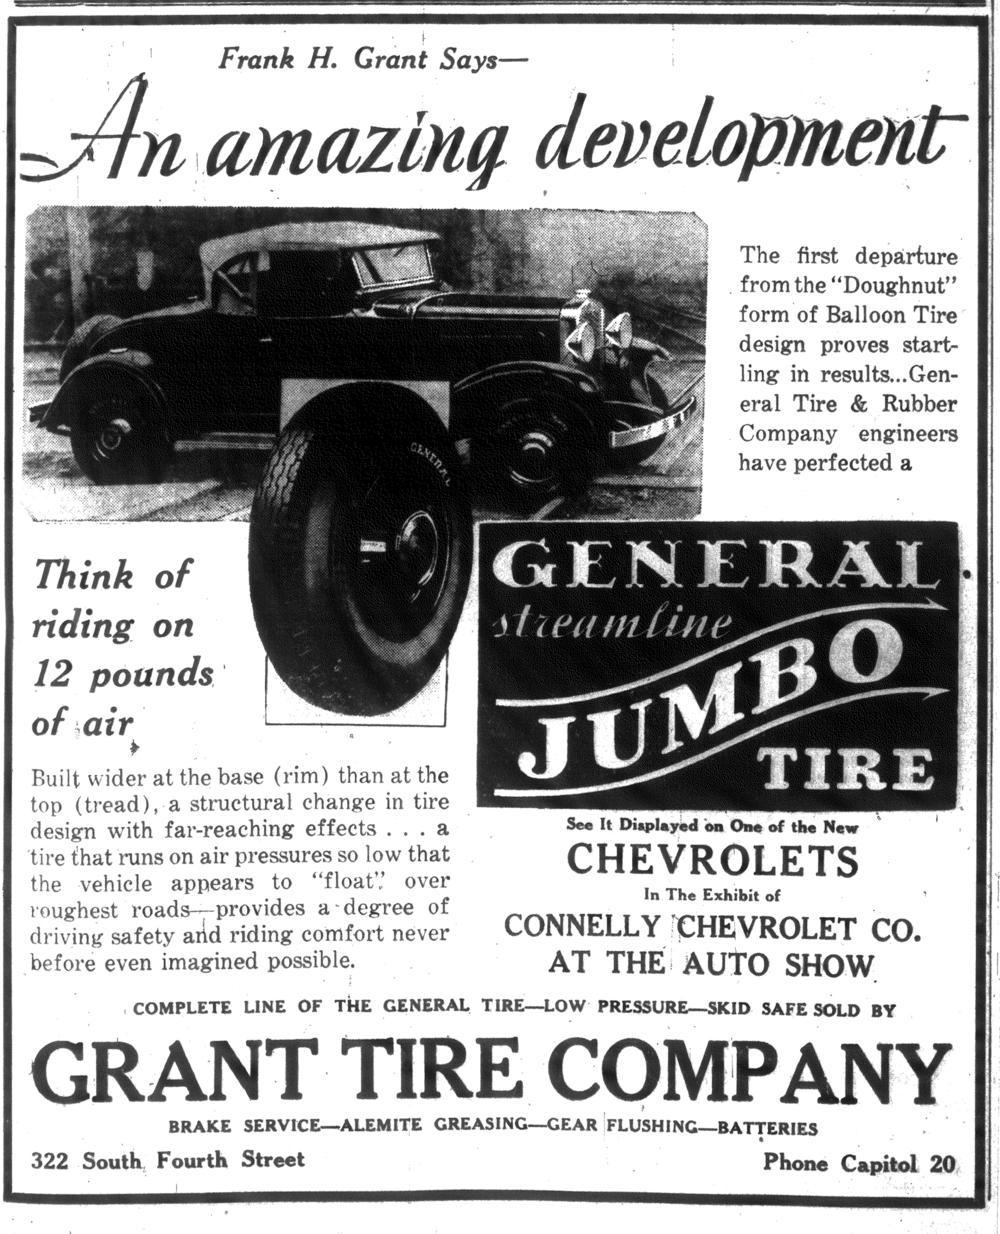 Grant Tire ad_t.jpg